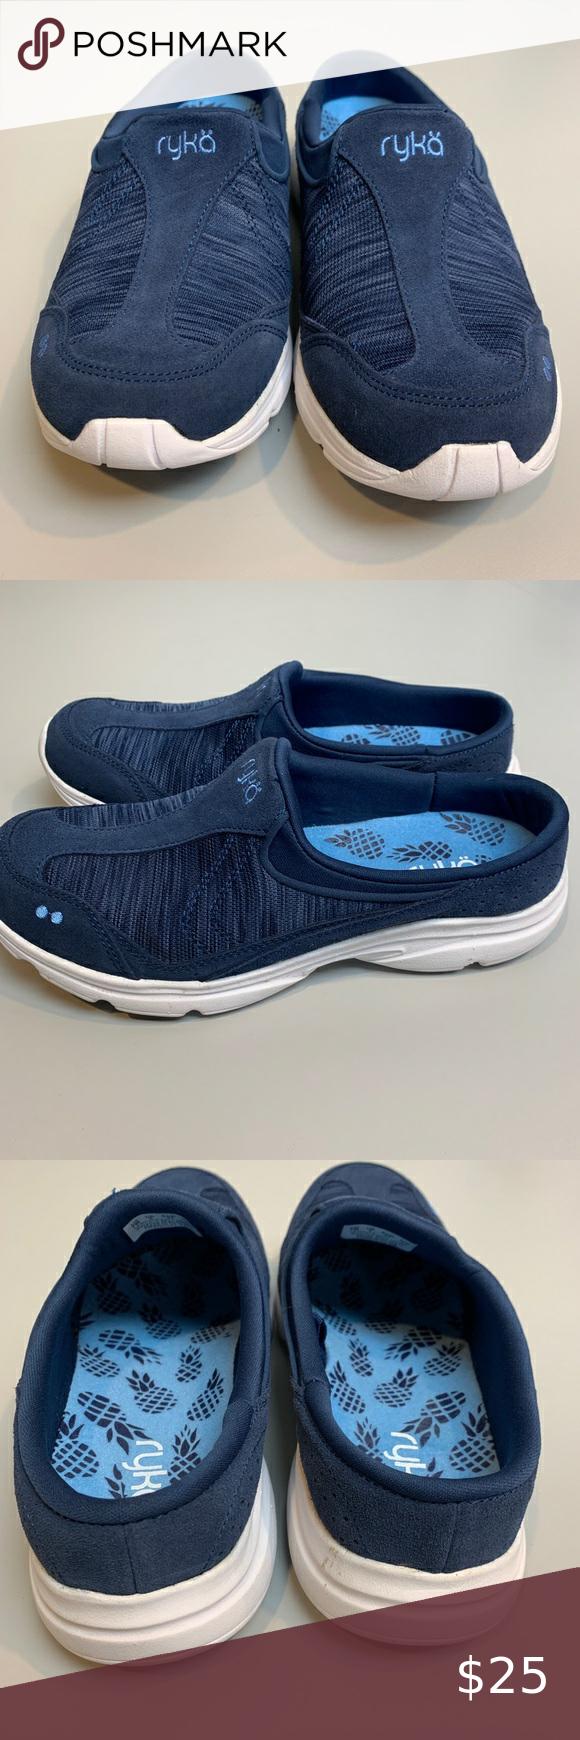 Ryka slip on tennis shoes in 2020